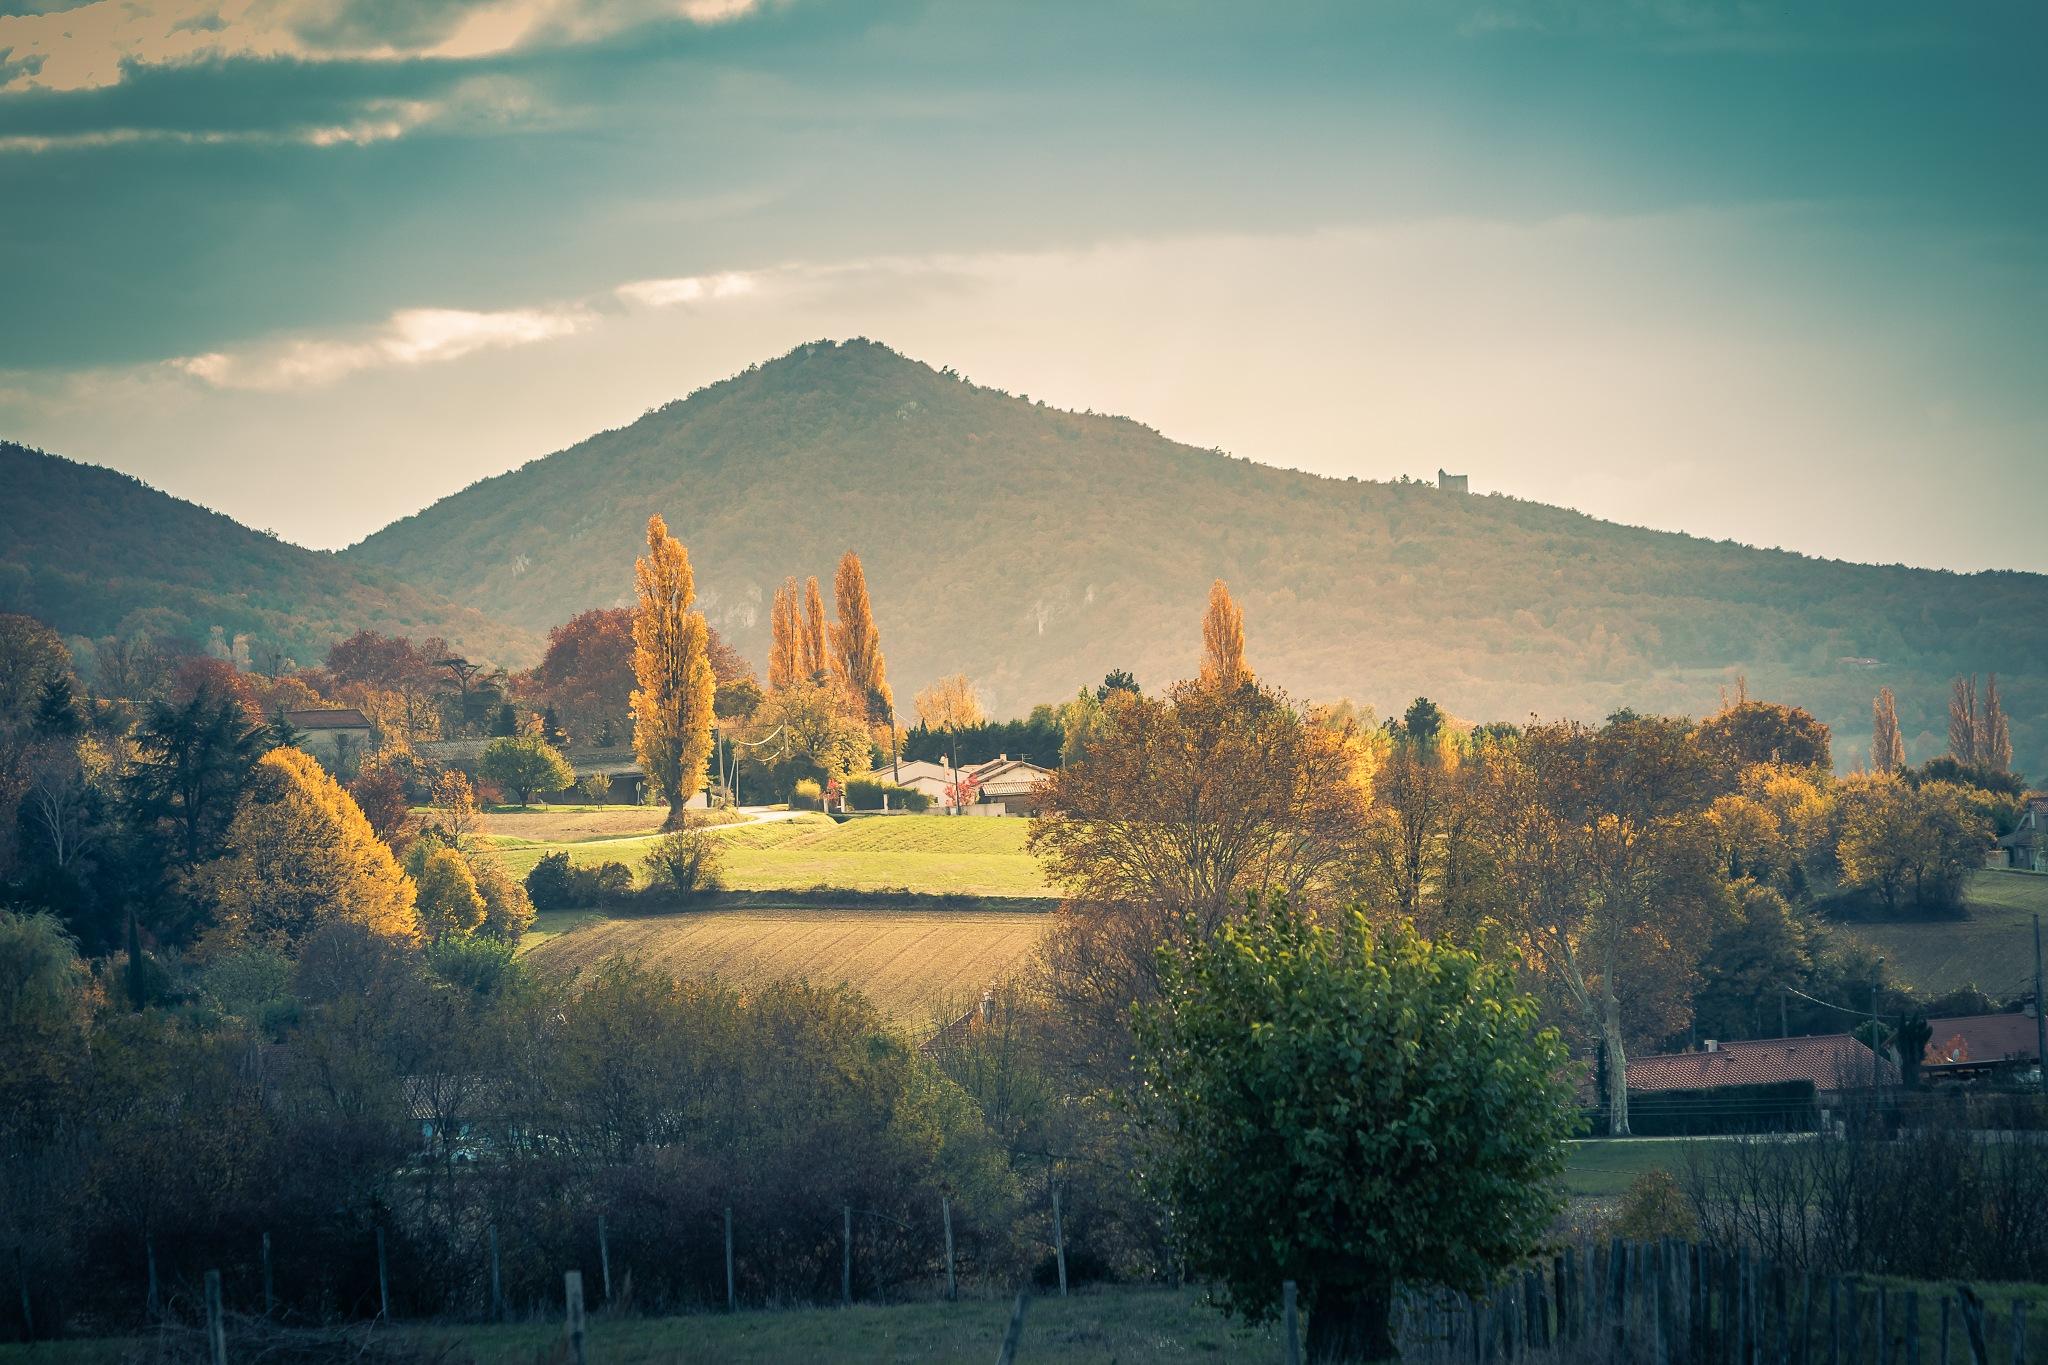 Landscape near Peyrus, France by Jean-Charles C.